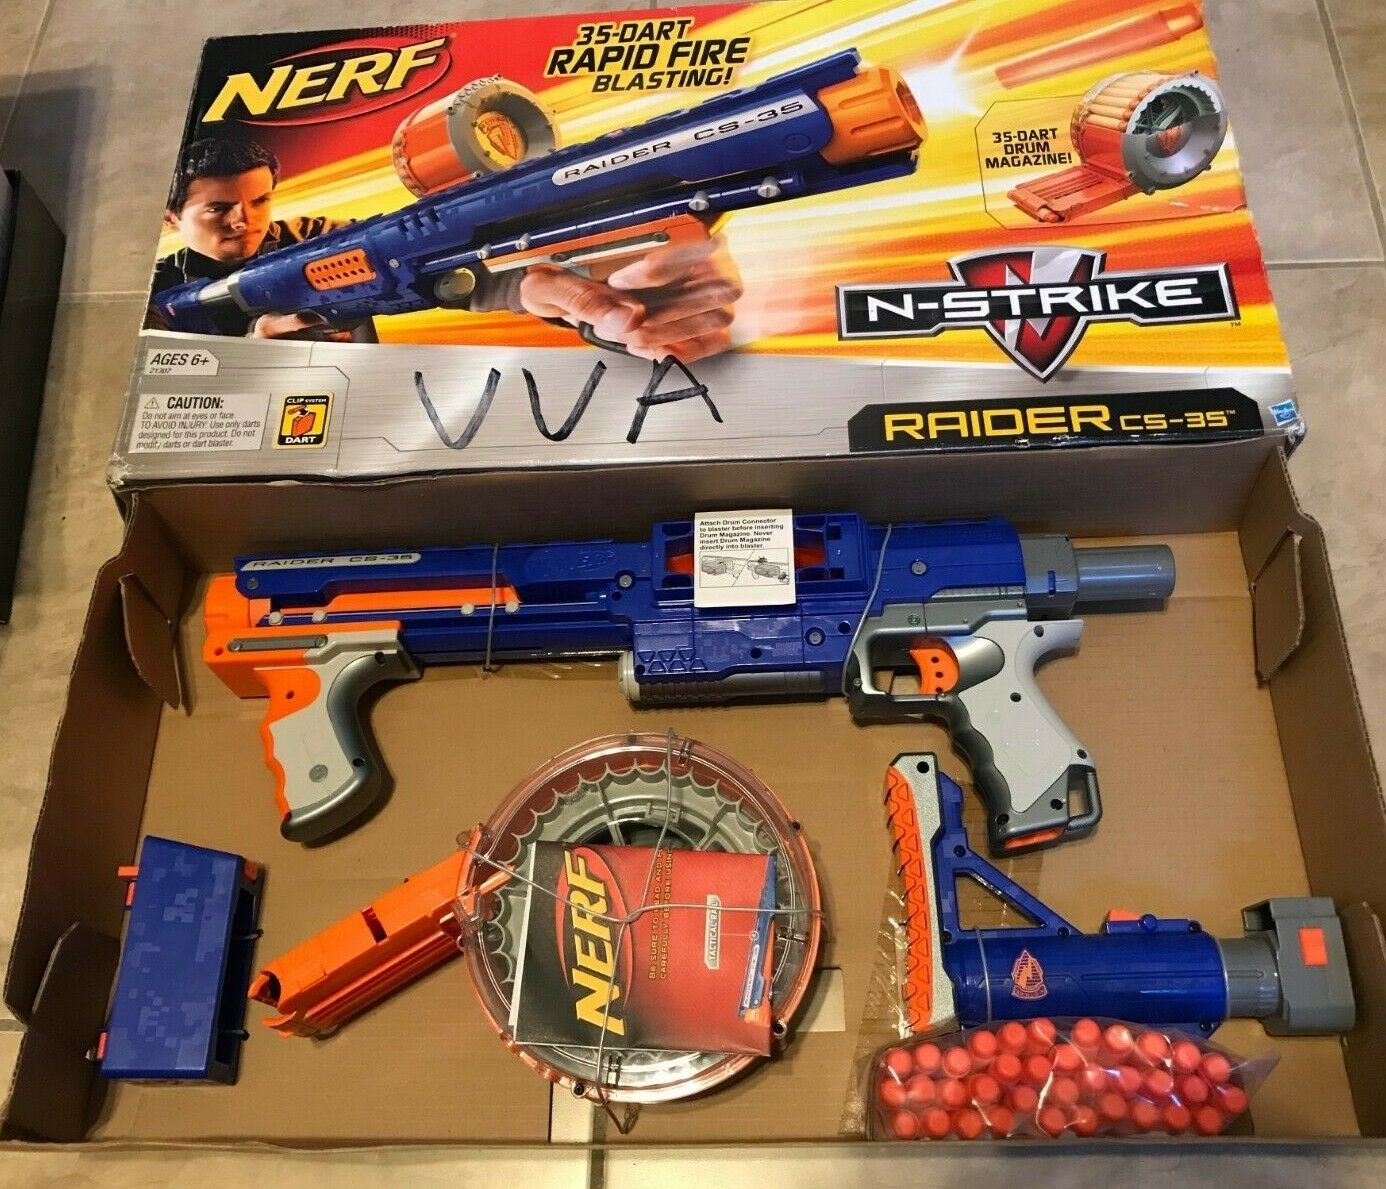 Nerf Nerf Nerf N-Strike CS-35 Raider Blaster Rapid Fire Gun NEW Open Box b4610a